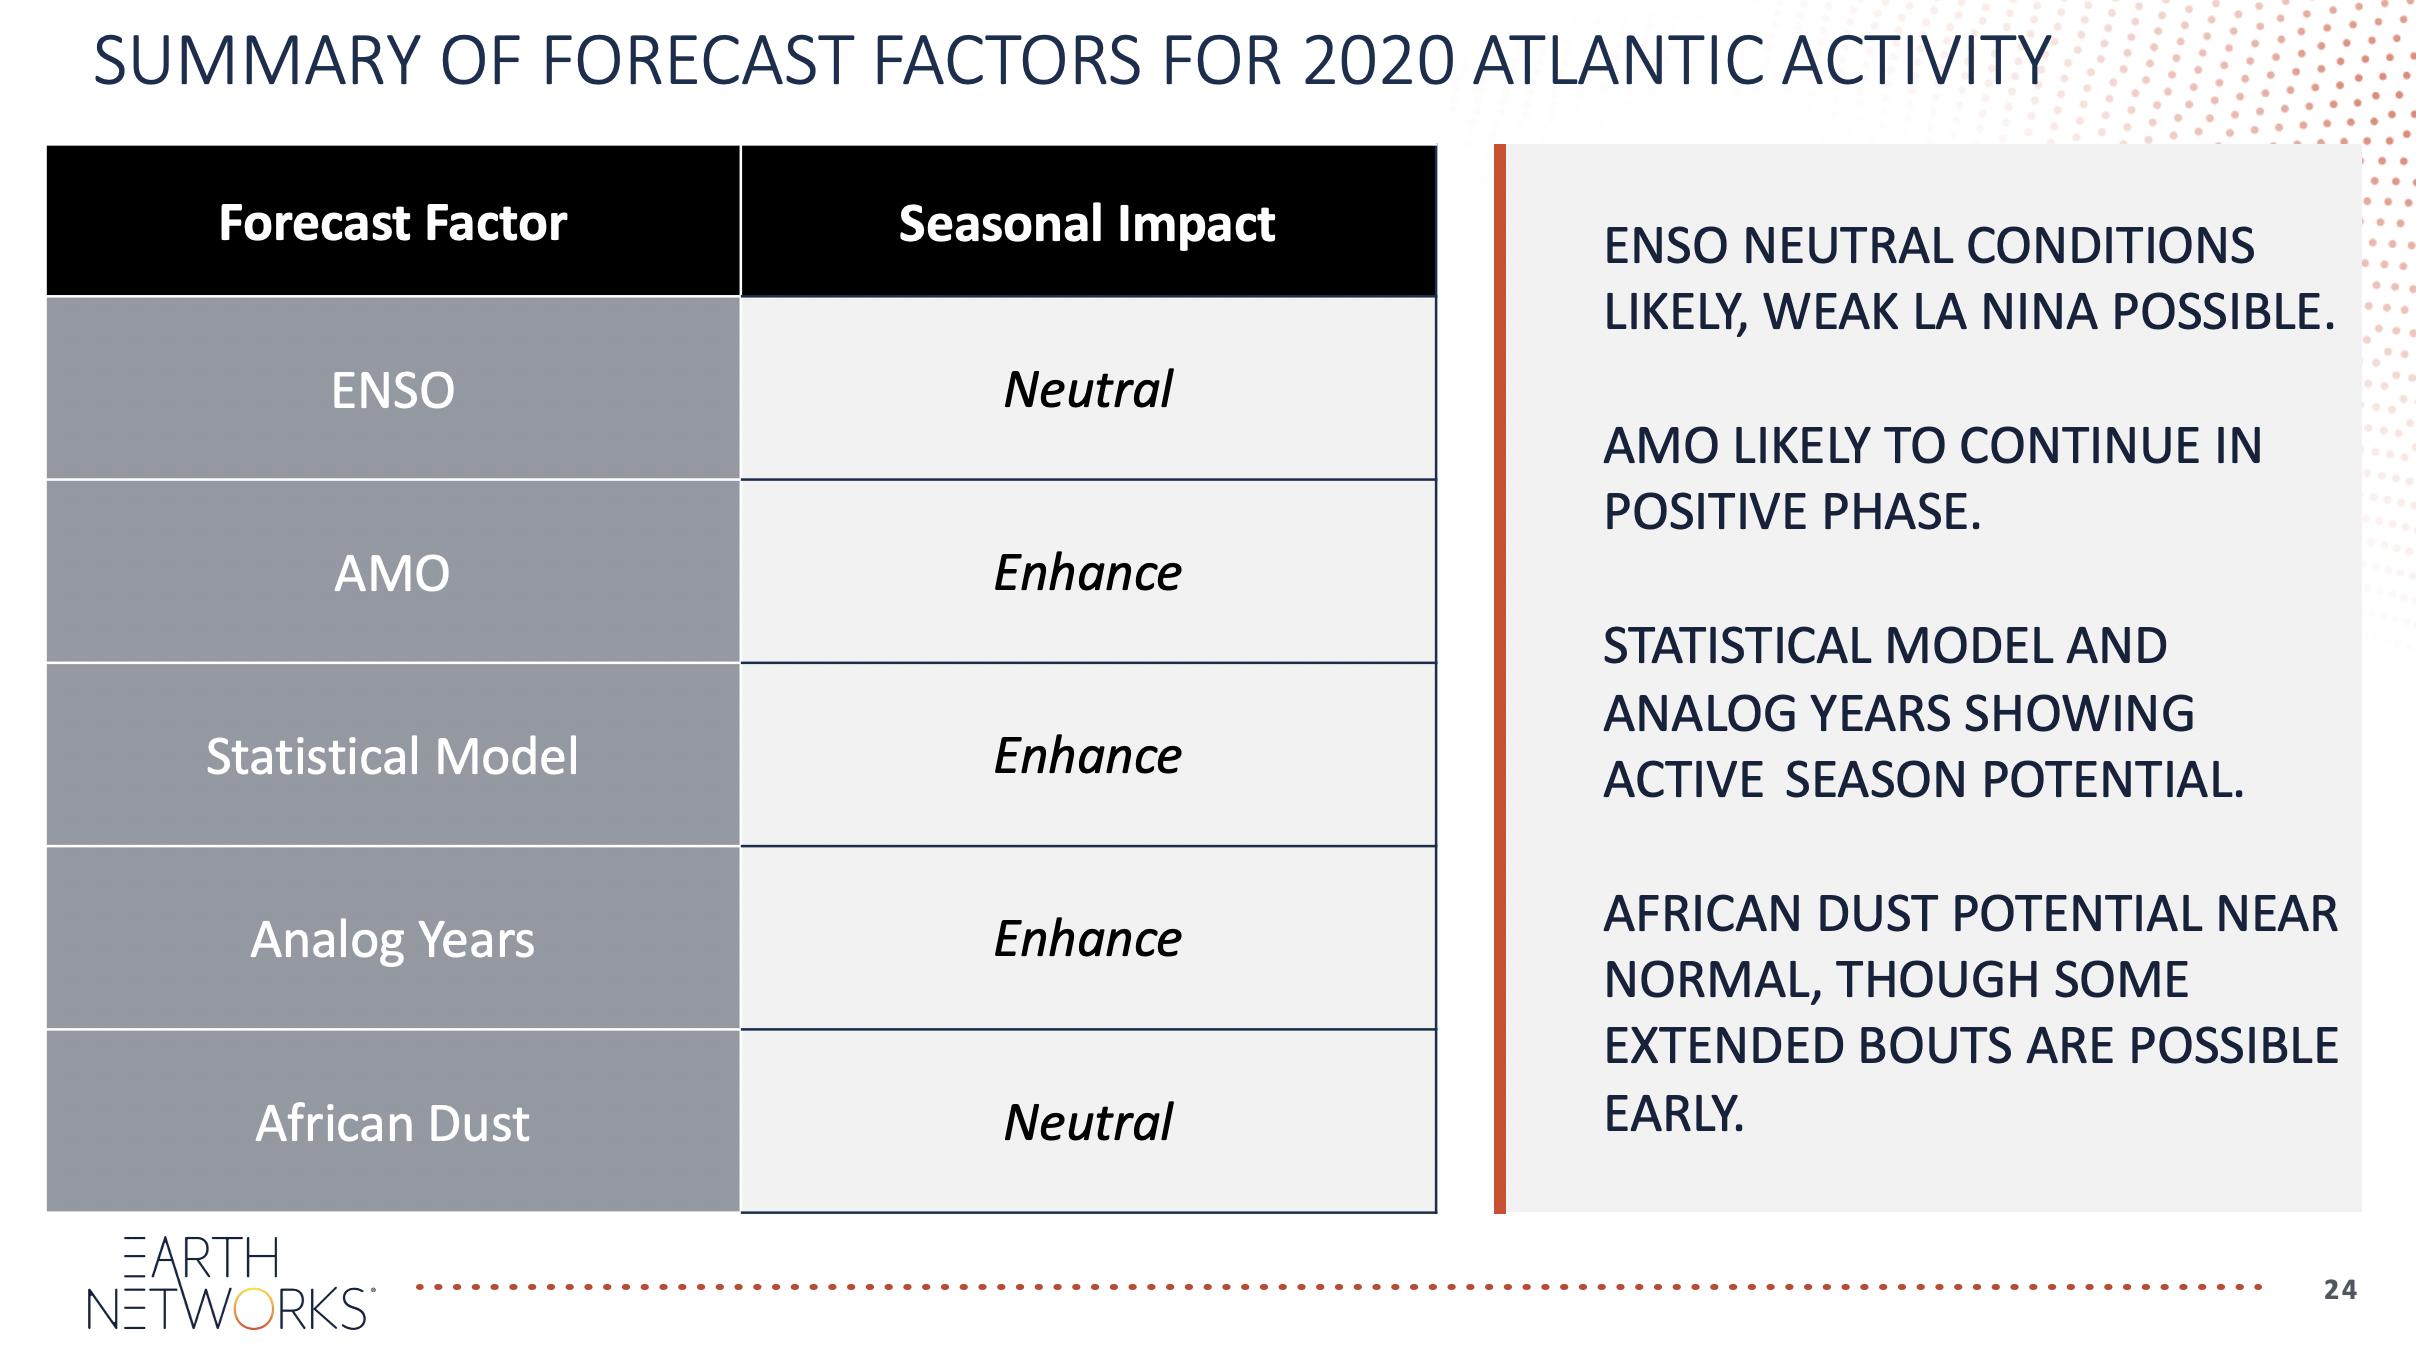 2020 Hurricane Season Predictors and Factors